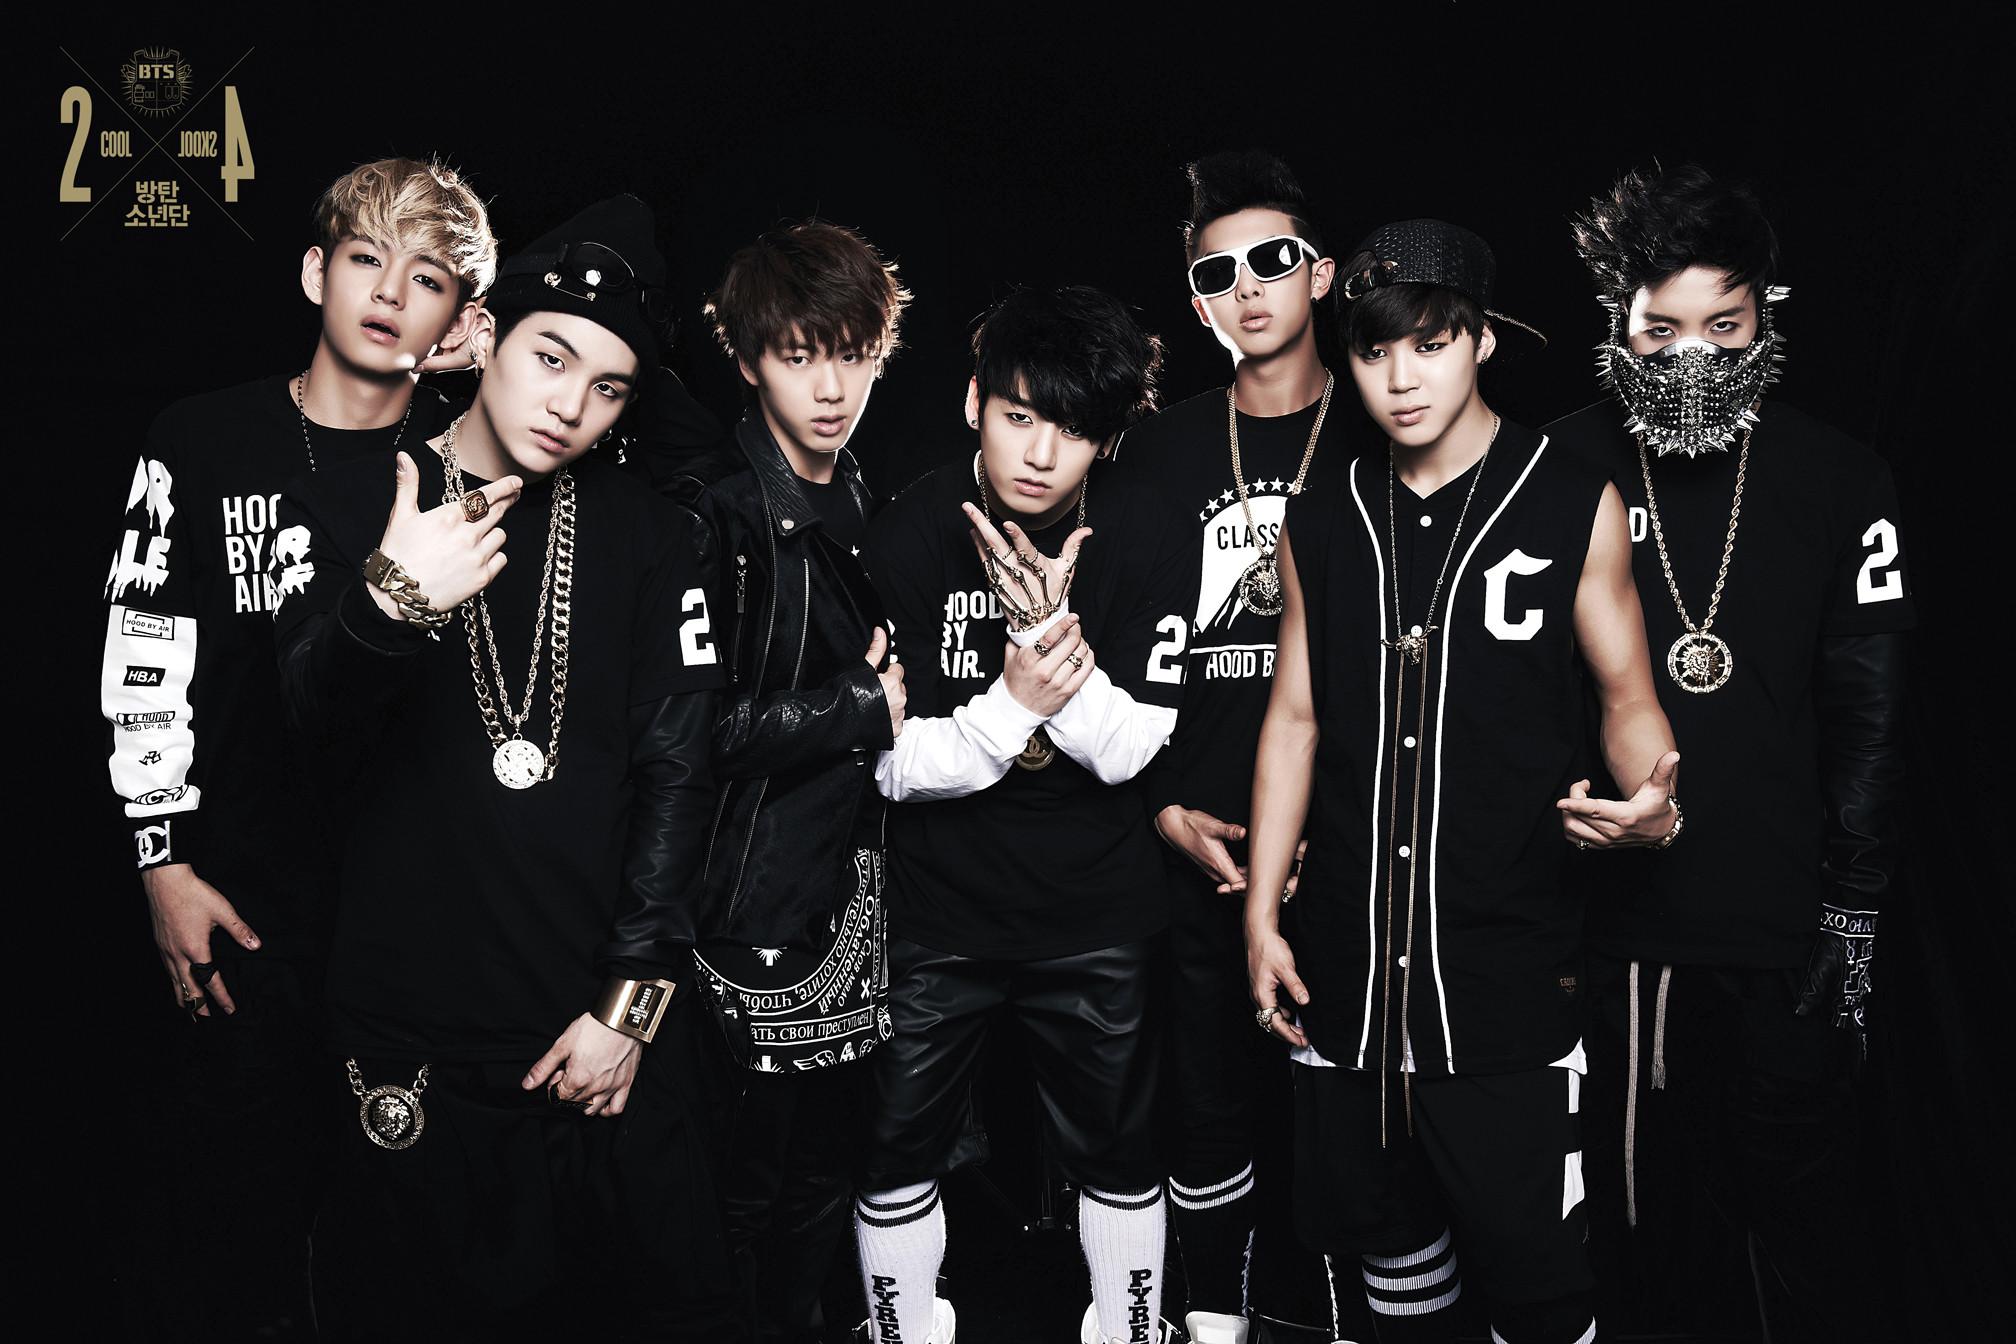 KPOP HD Wallpaper BTS Bangtan Boys Korean Boys Group KPOP HD Wallpaper .